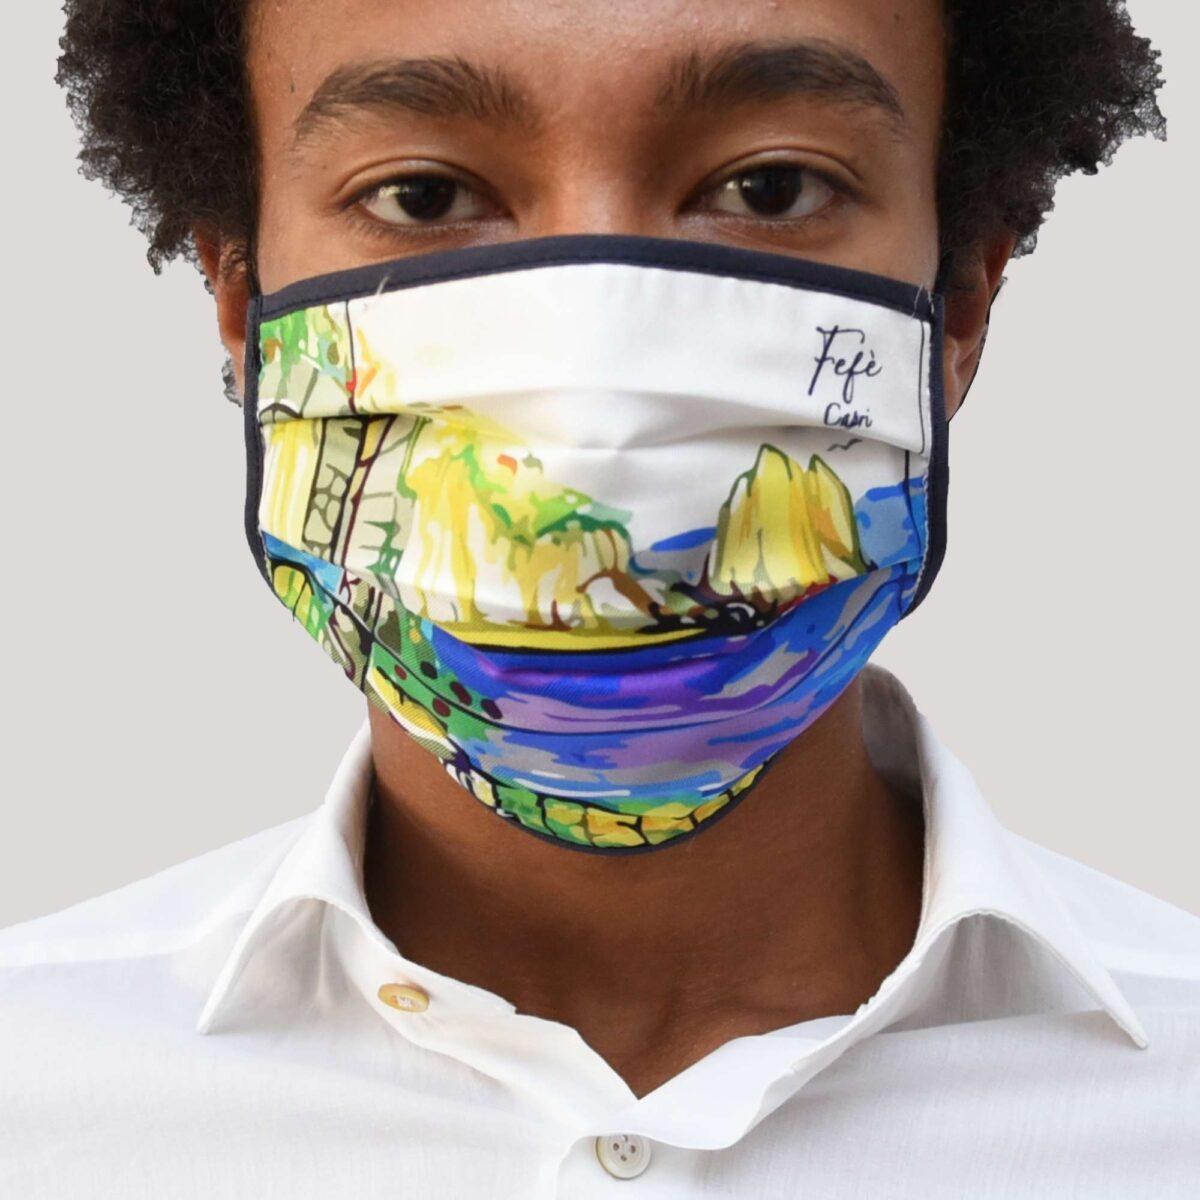 mascherina anti covid in seta lavabile